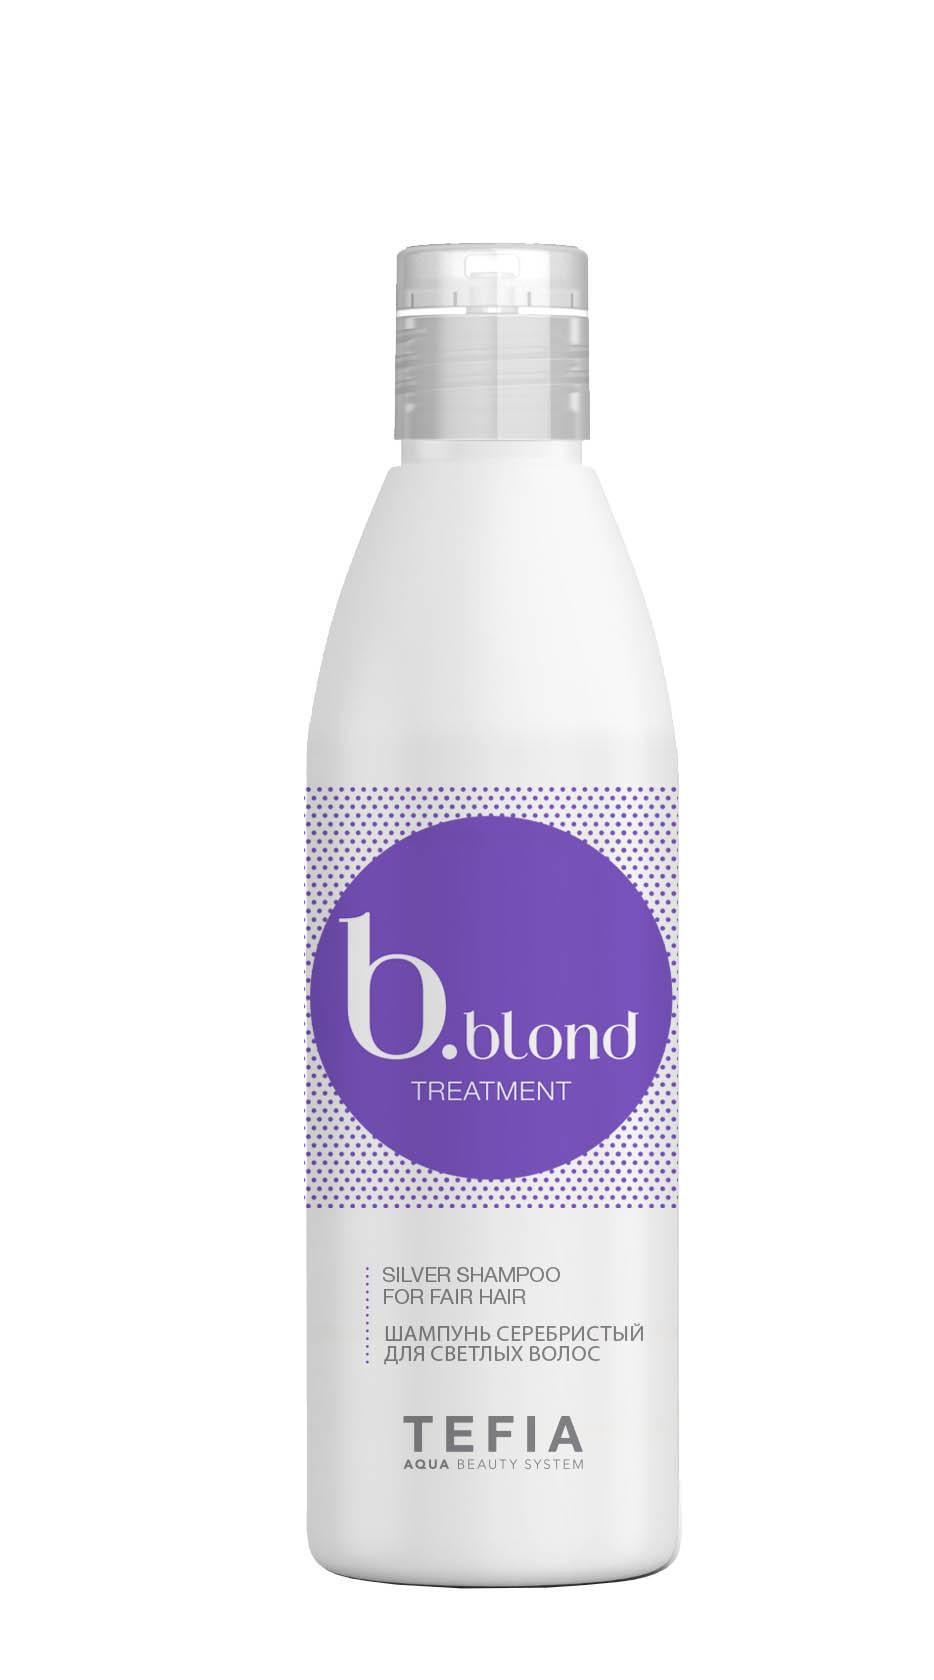 TEFIA Шампунь для светлых волос серебристый / Bblond Treatment 250 мл